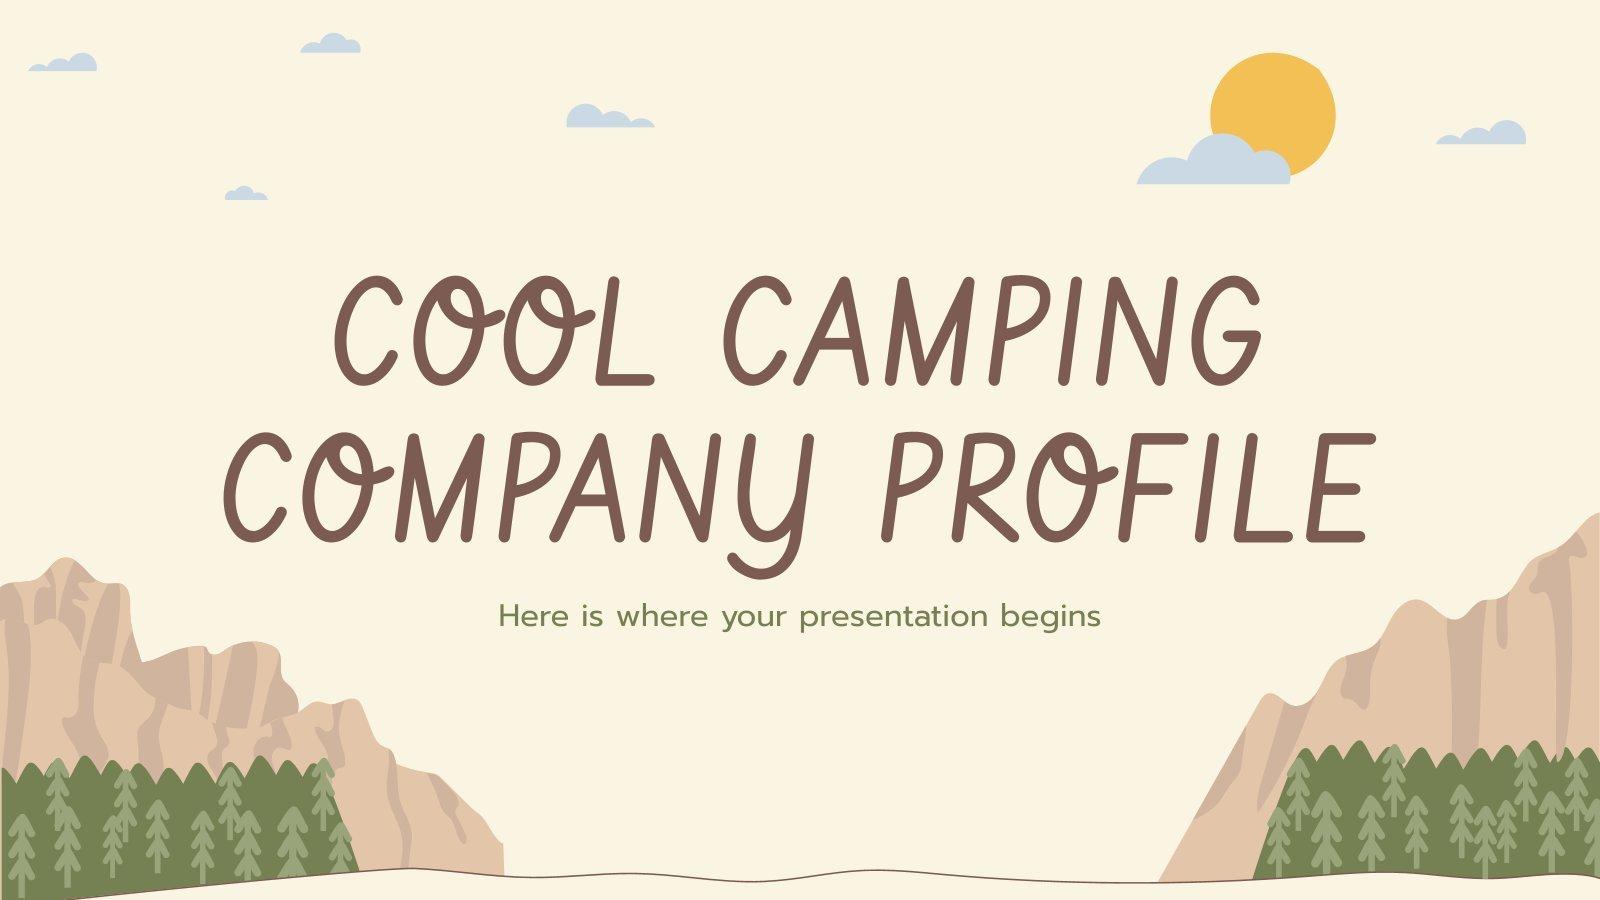 Cool Camping Company Profile presentation template